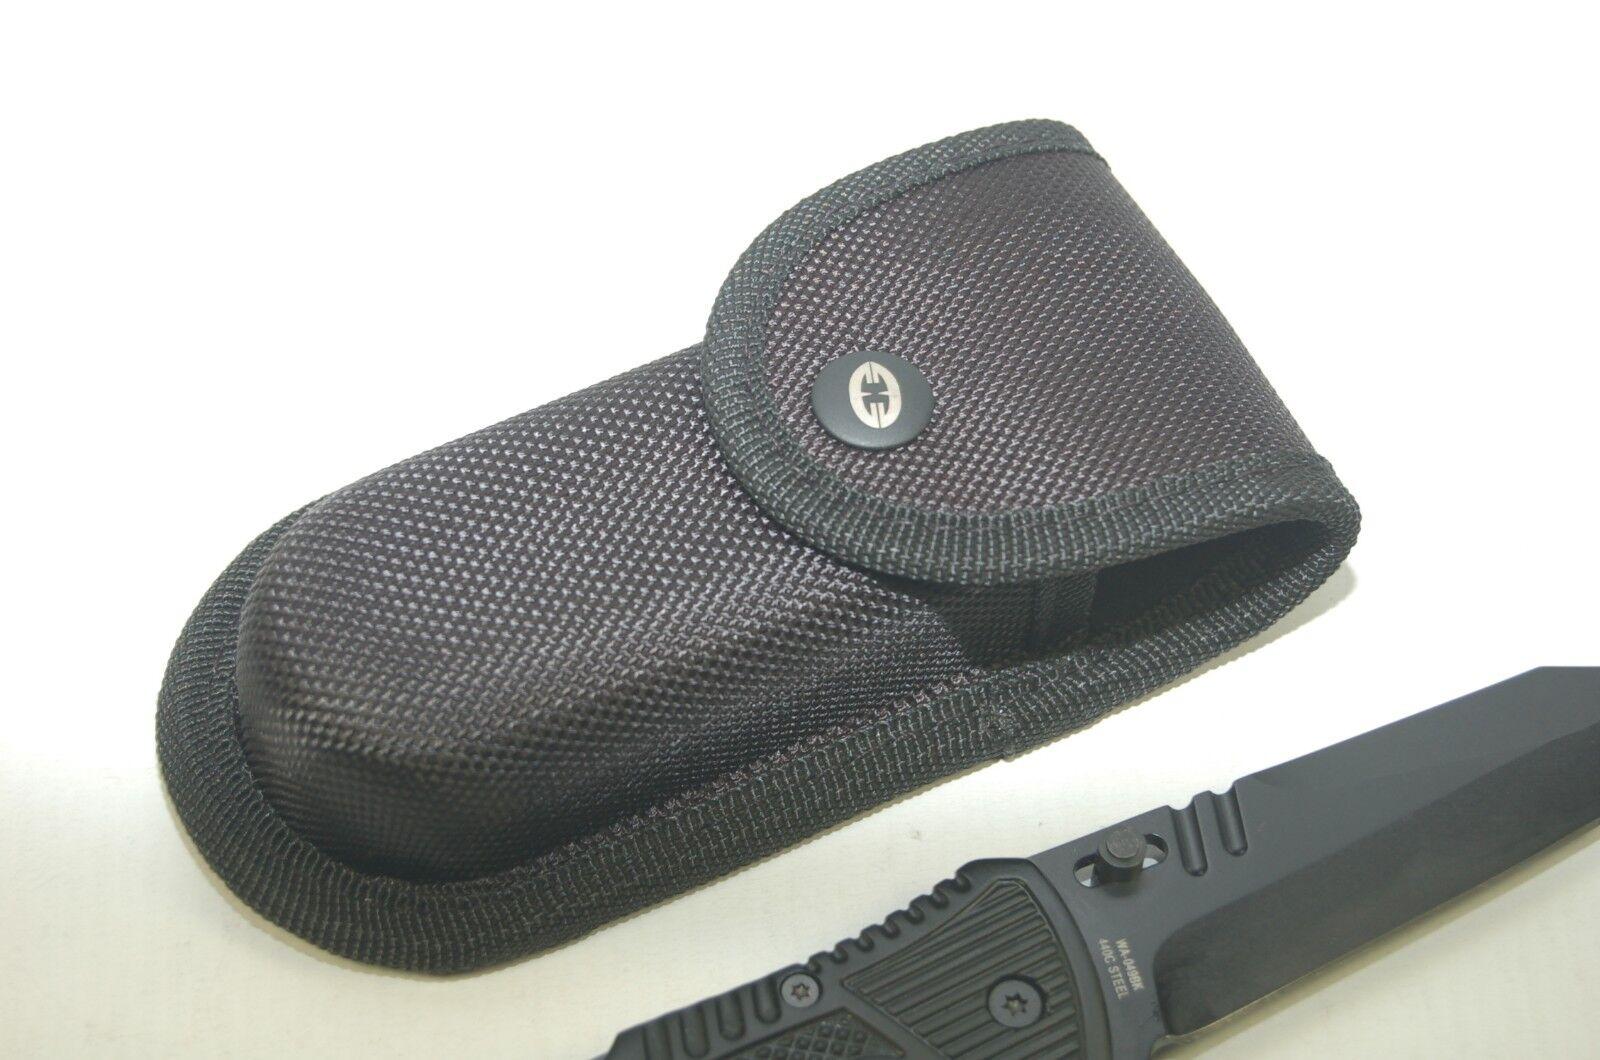 Witharmour Racketeer black 440 C Acier Couteau Couteau Couteau de poche escamotable couteau Tanto Sac 83b98c